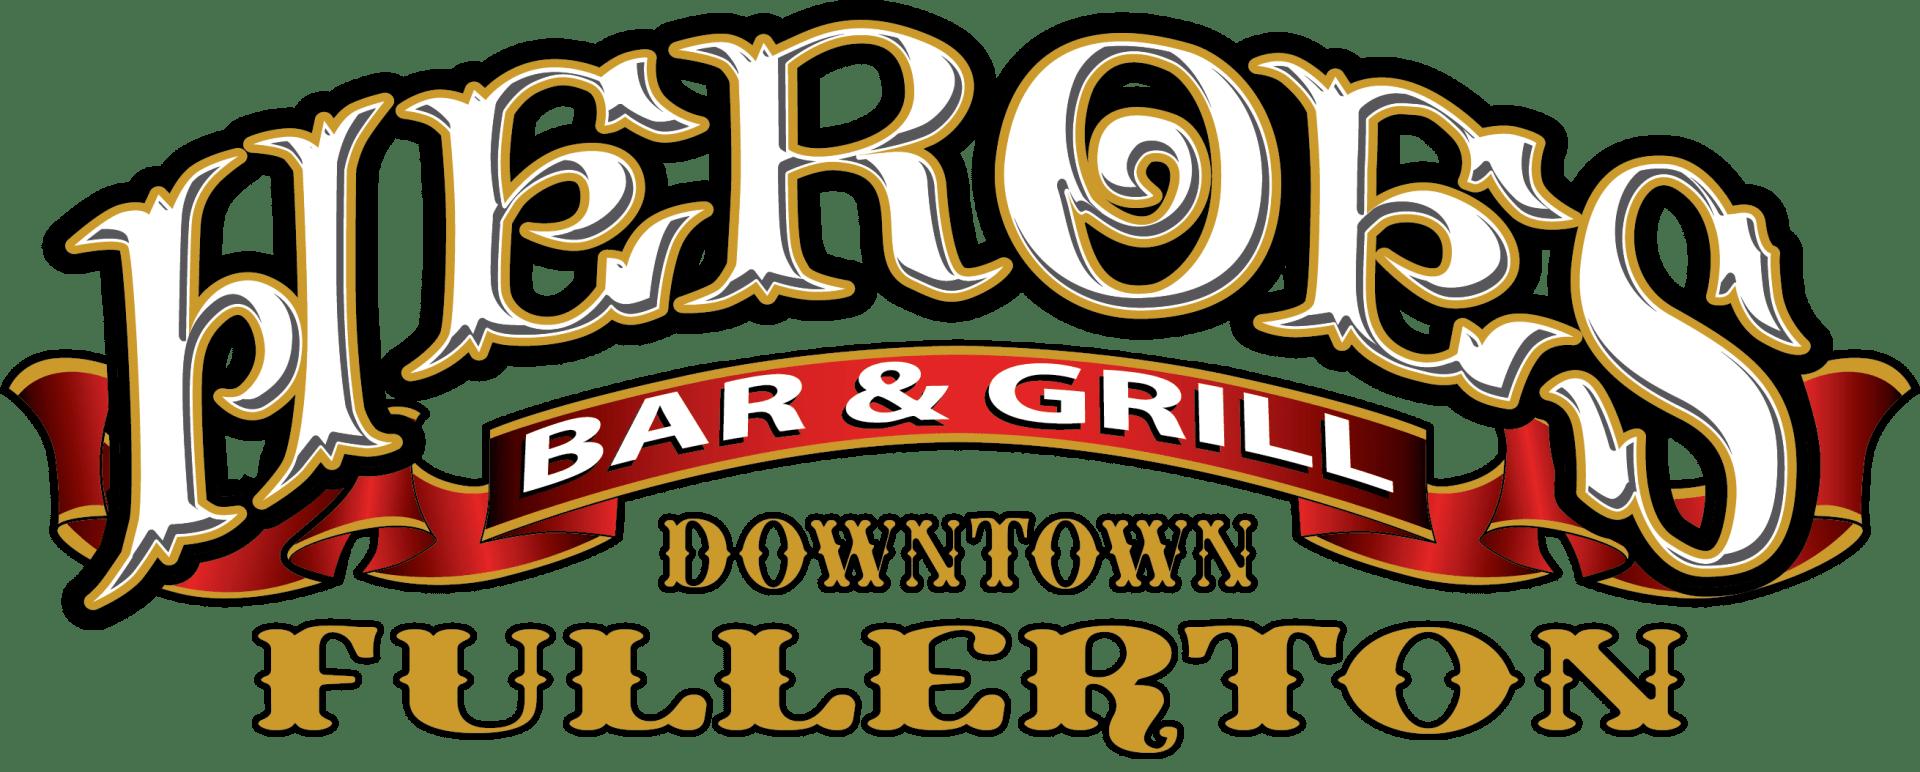 Heroes Bar & Grill Logo